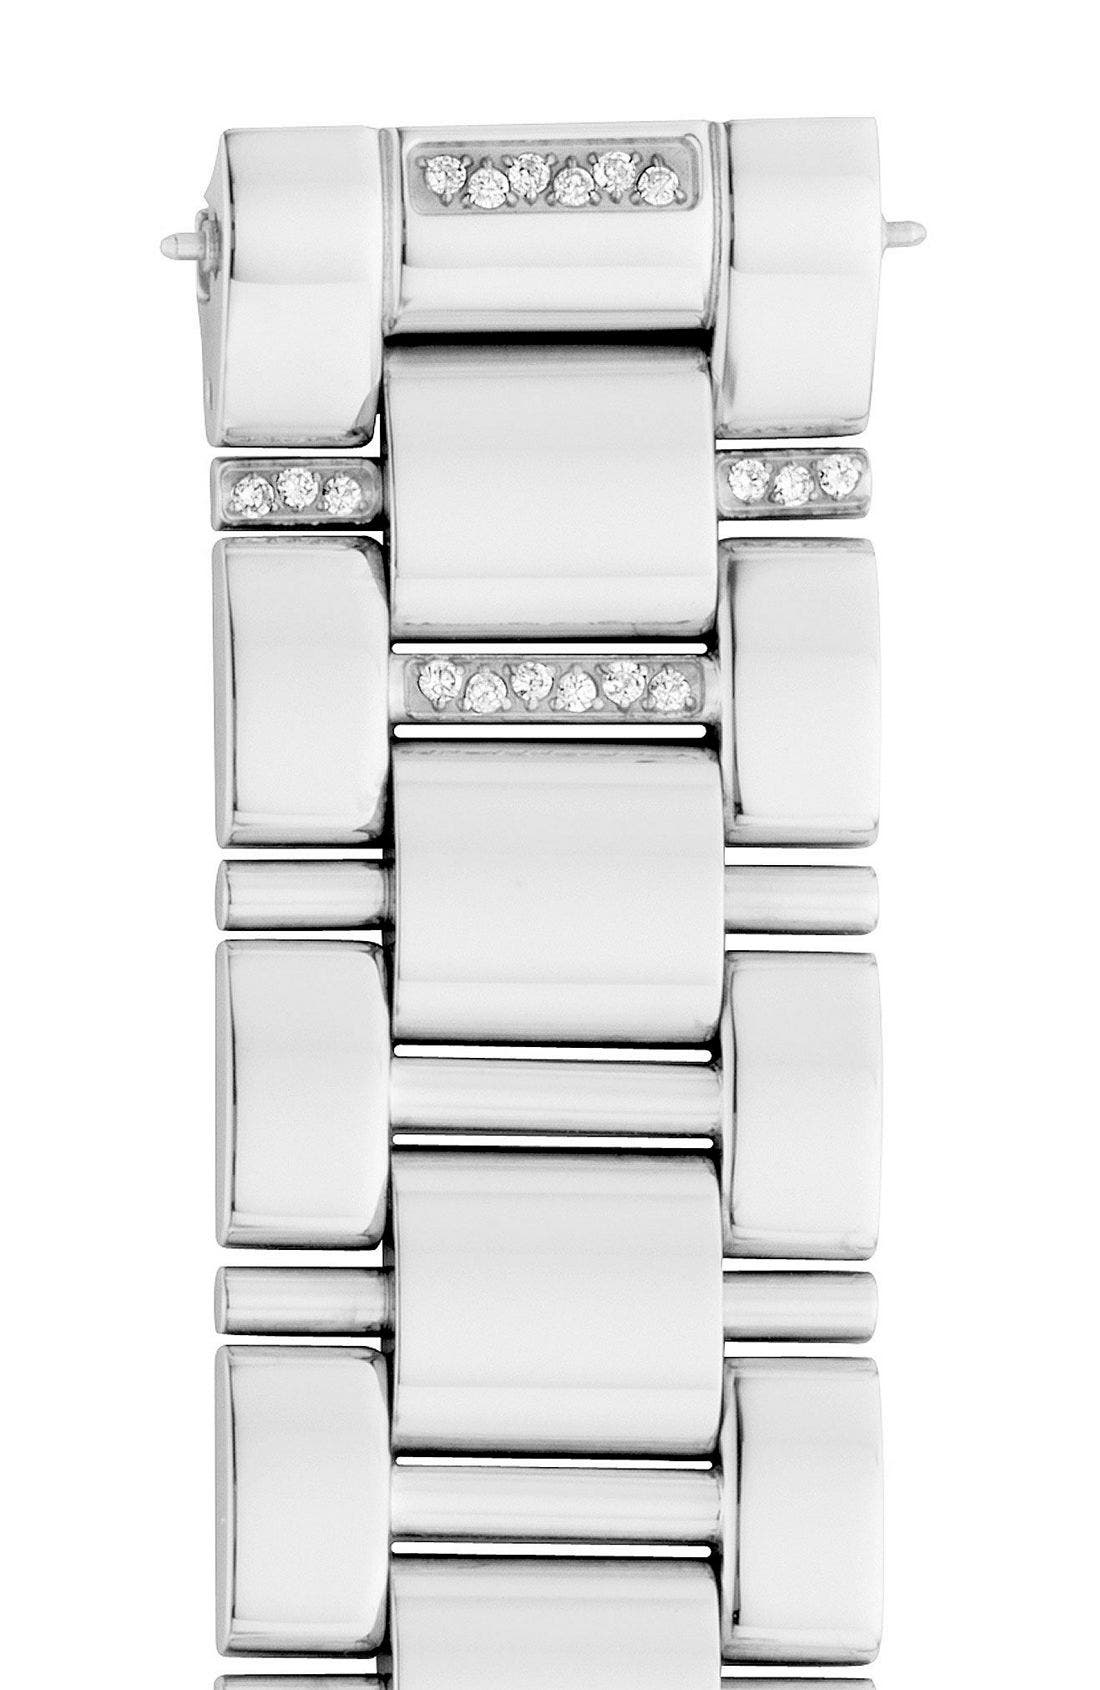 Alternate Image 1 Selected - MICHELE 'Deco Diamond' Watch Case & 18mm Bracelet